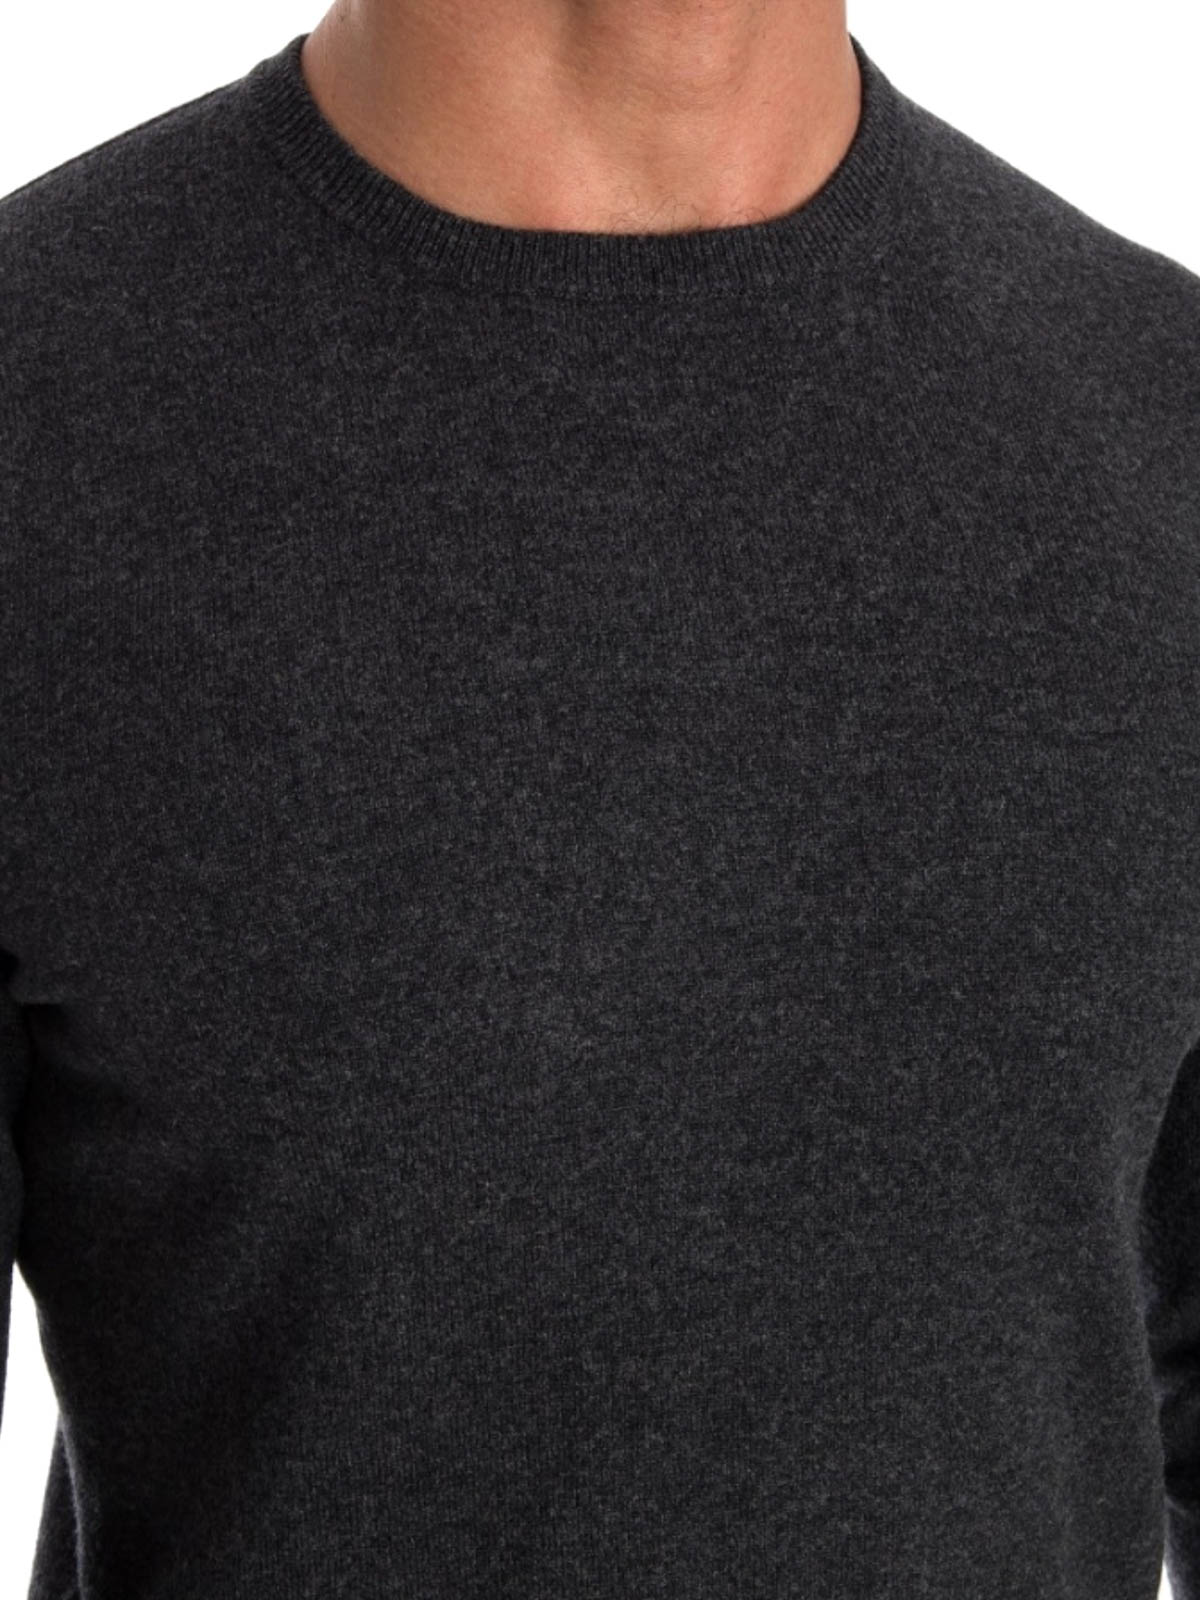 Wool and cashmere sweater by Drumohr - crew necks | iKRIX